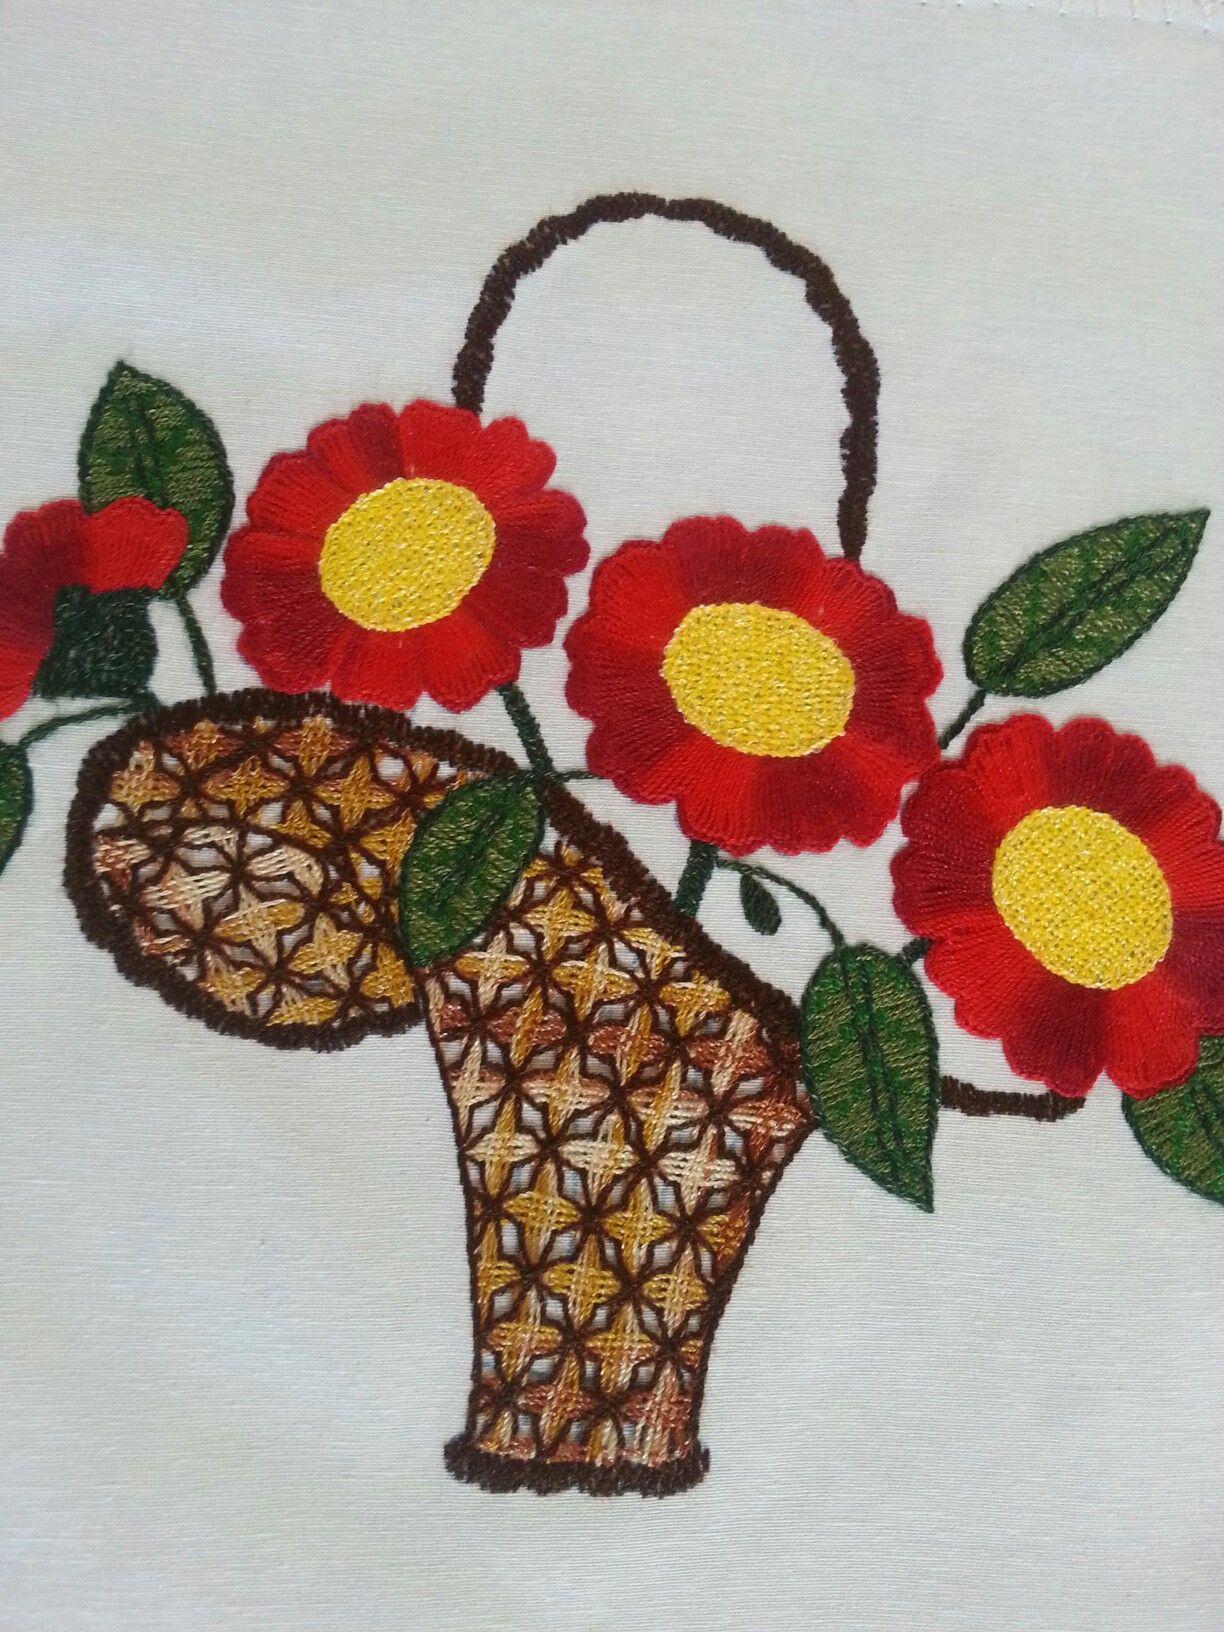 Canasta Con Flores Rojas En Bordado Fantasia Bordado Fantasia